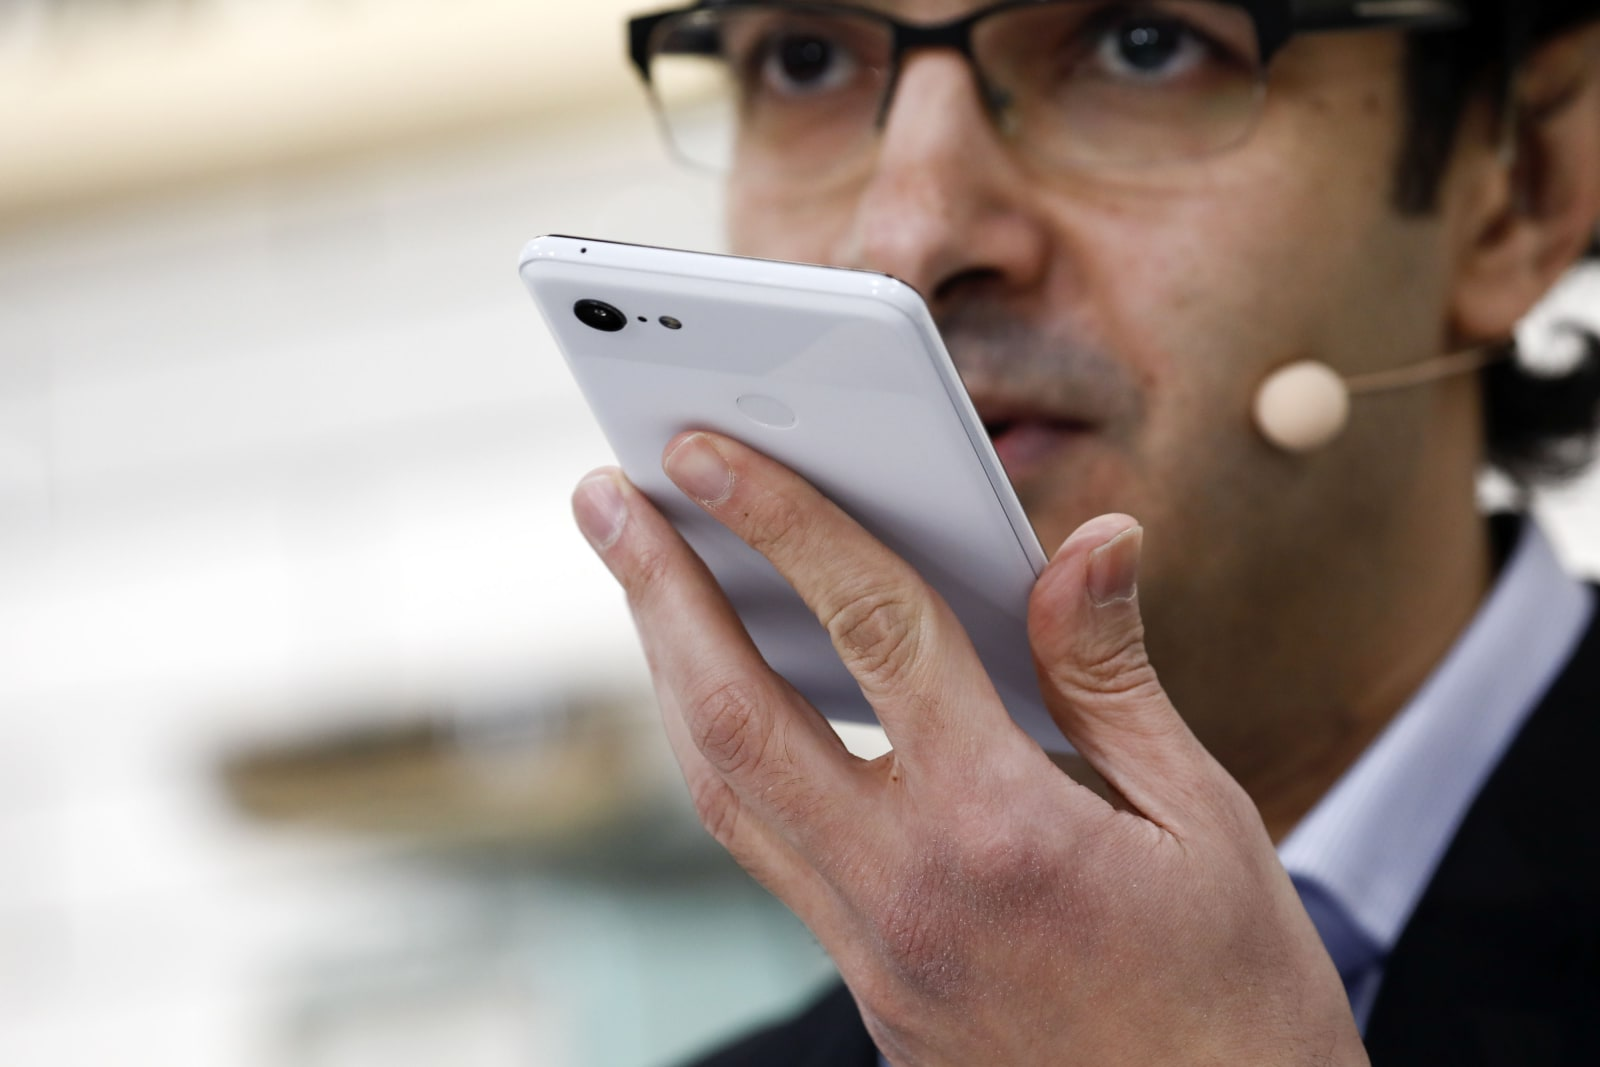 OK Google' will no longer fully unlock your phone